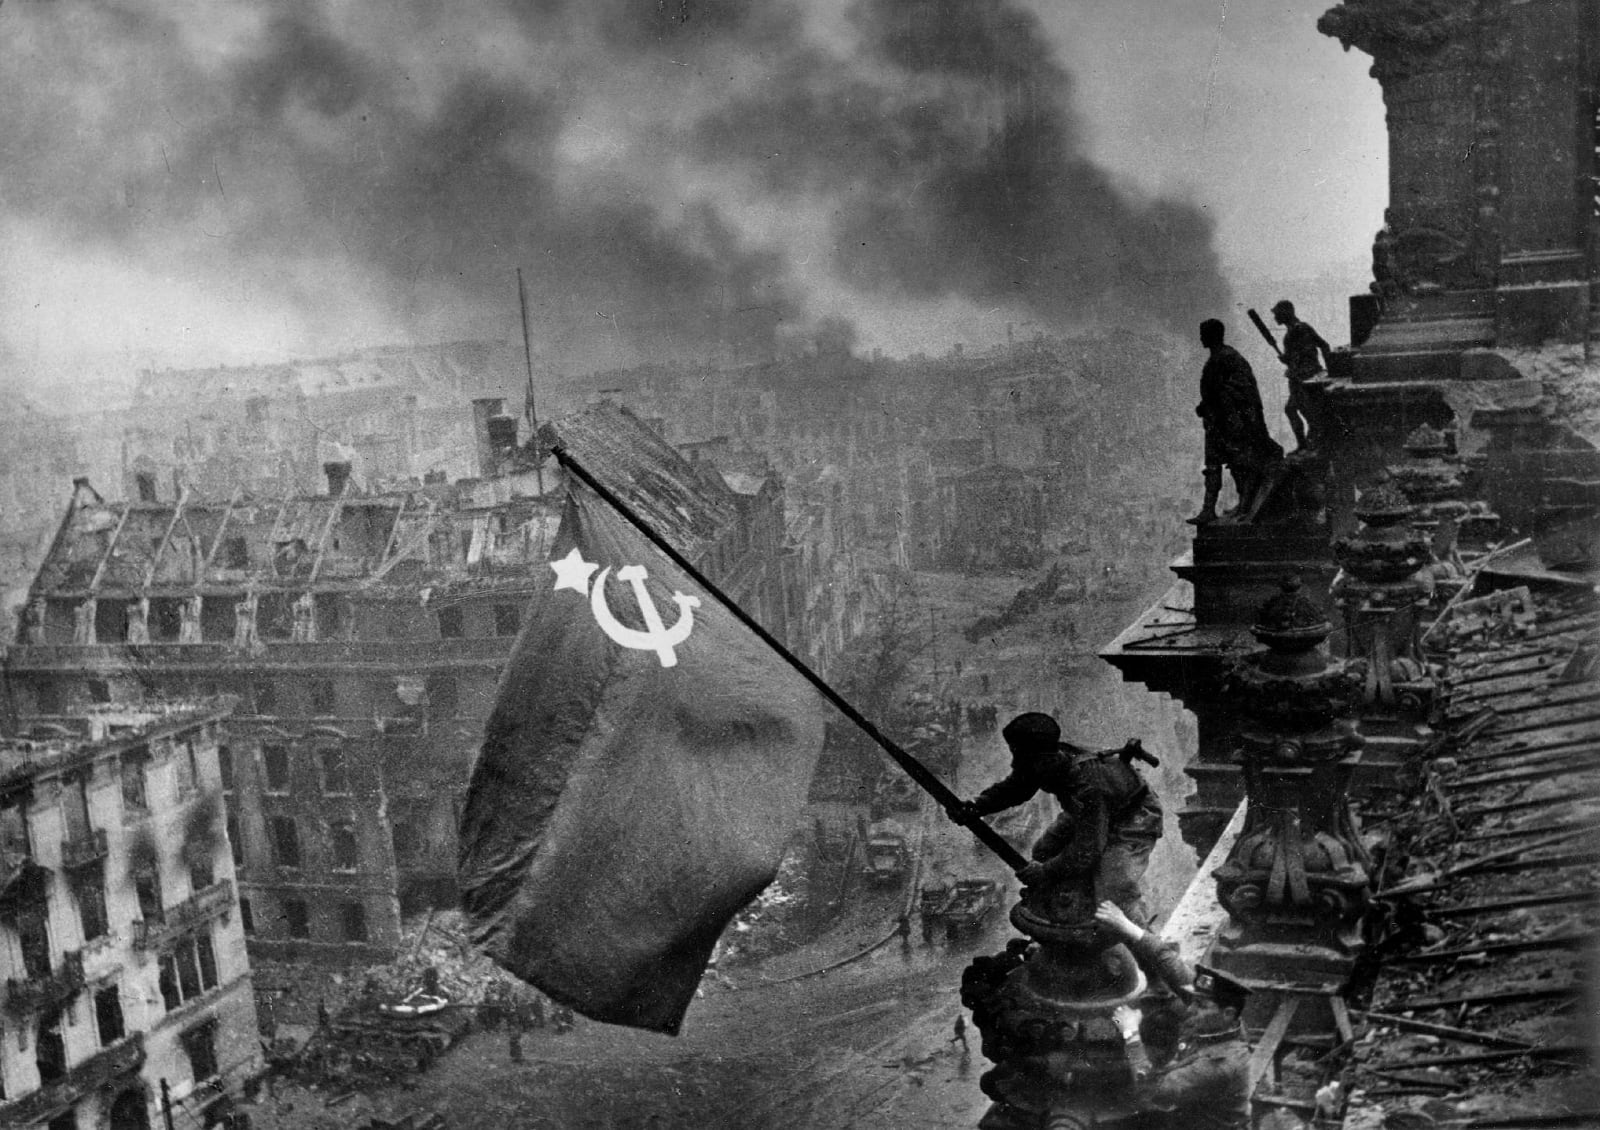 Yevgeny Khaldei - Soviet Flag Over the Reichstag, 1945